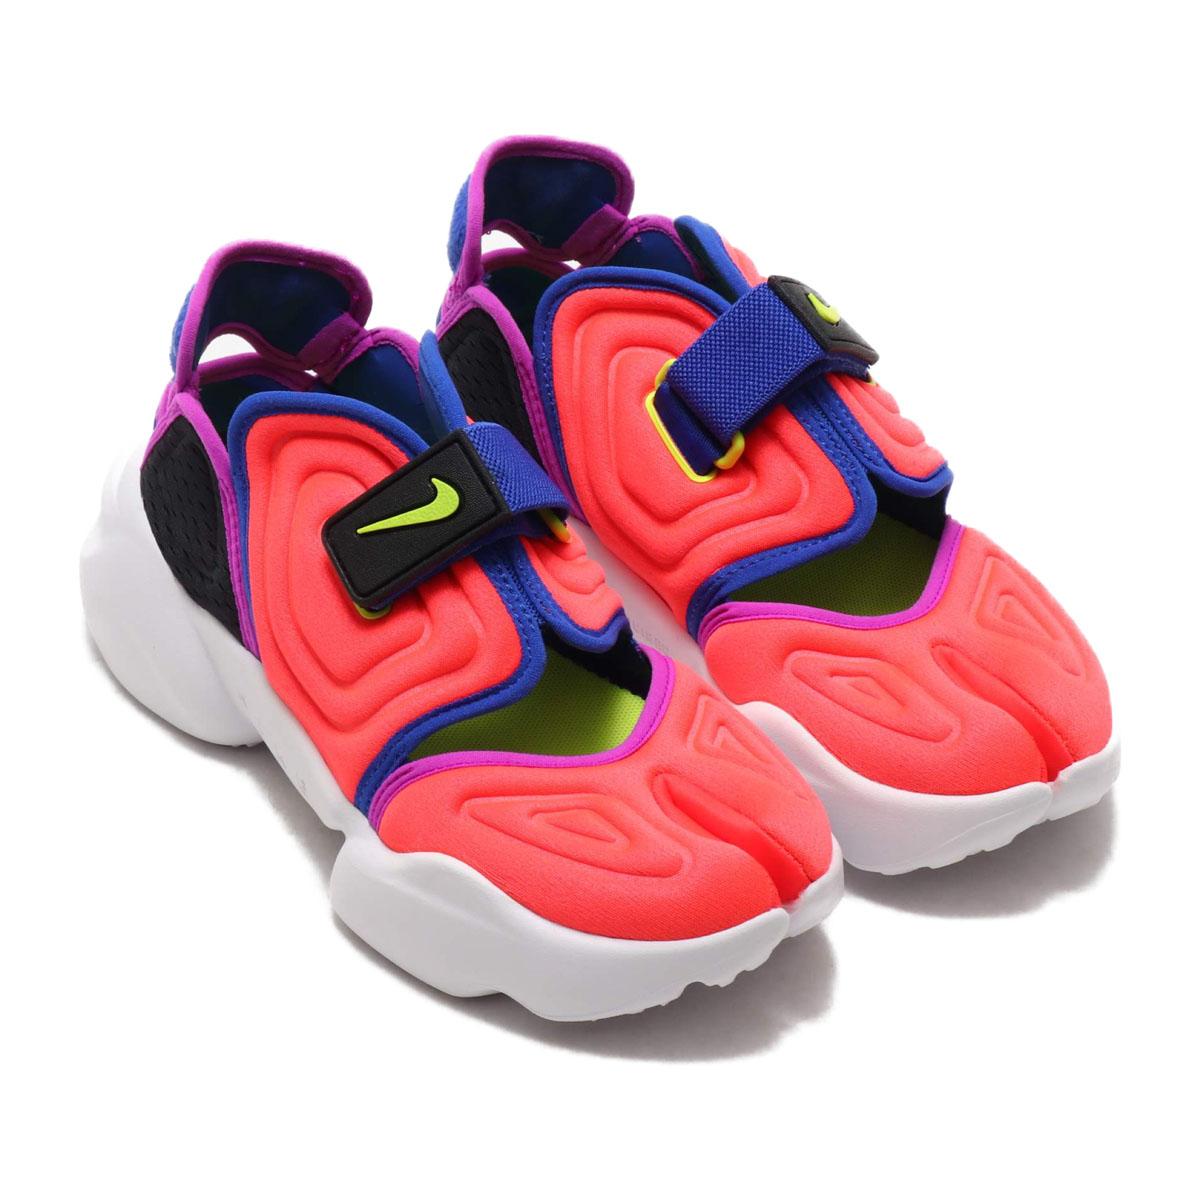 AQUA RIFT(アクアリフト)tabi-sneakers-trend-nike-aqua-rift